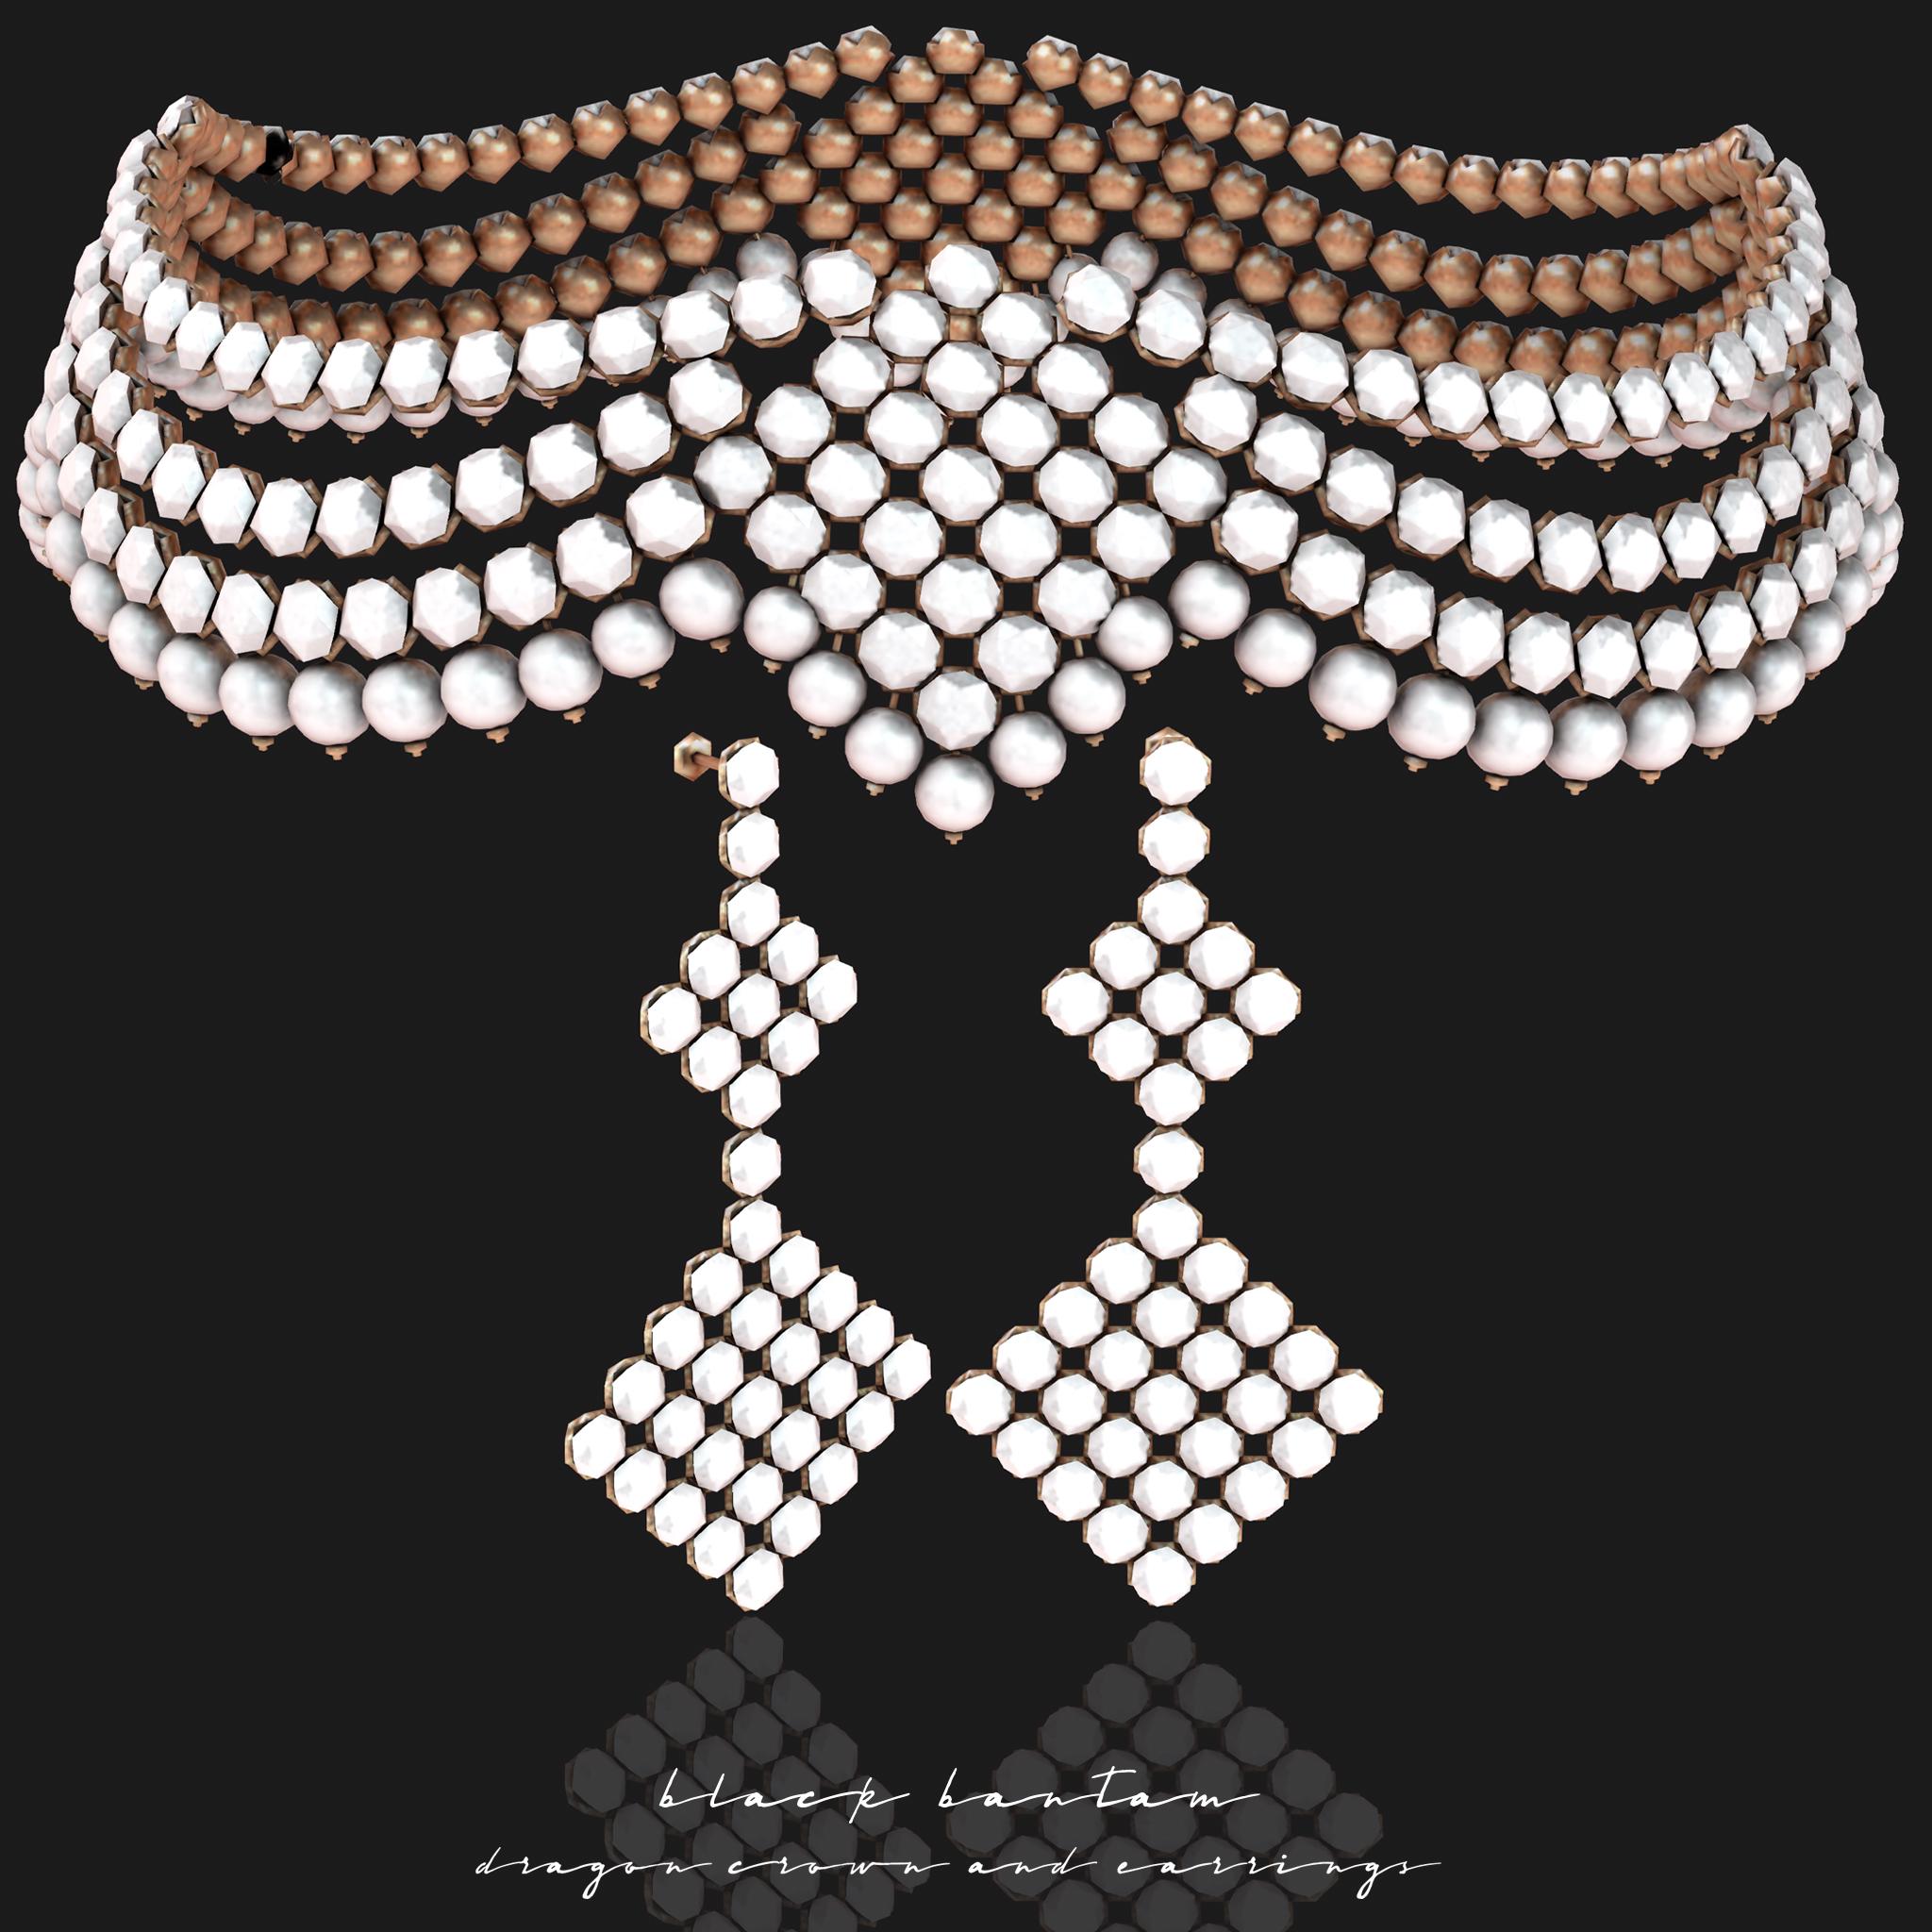 [Black Bantam] Dragon Queen Crown & Earrings Exclusive Promo Photo.jpg